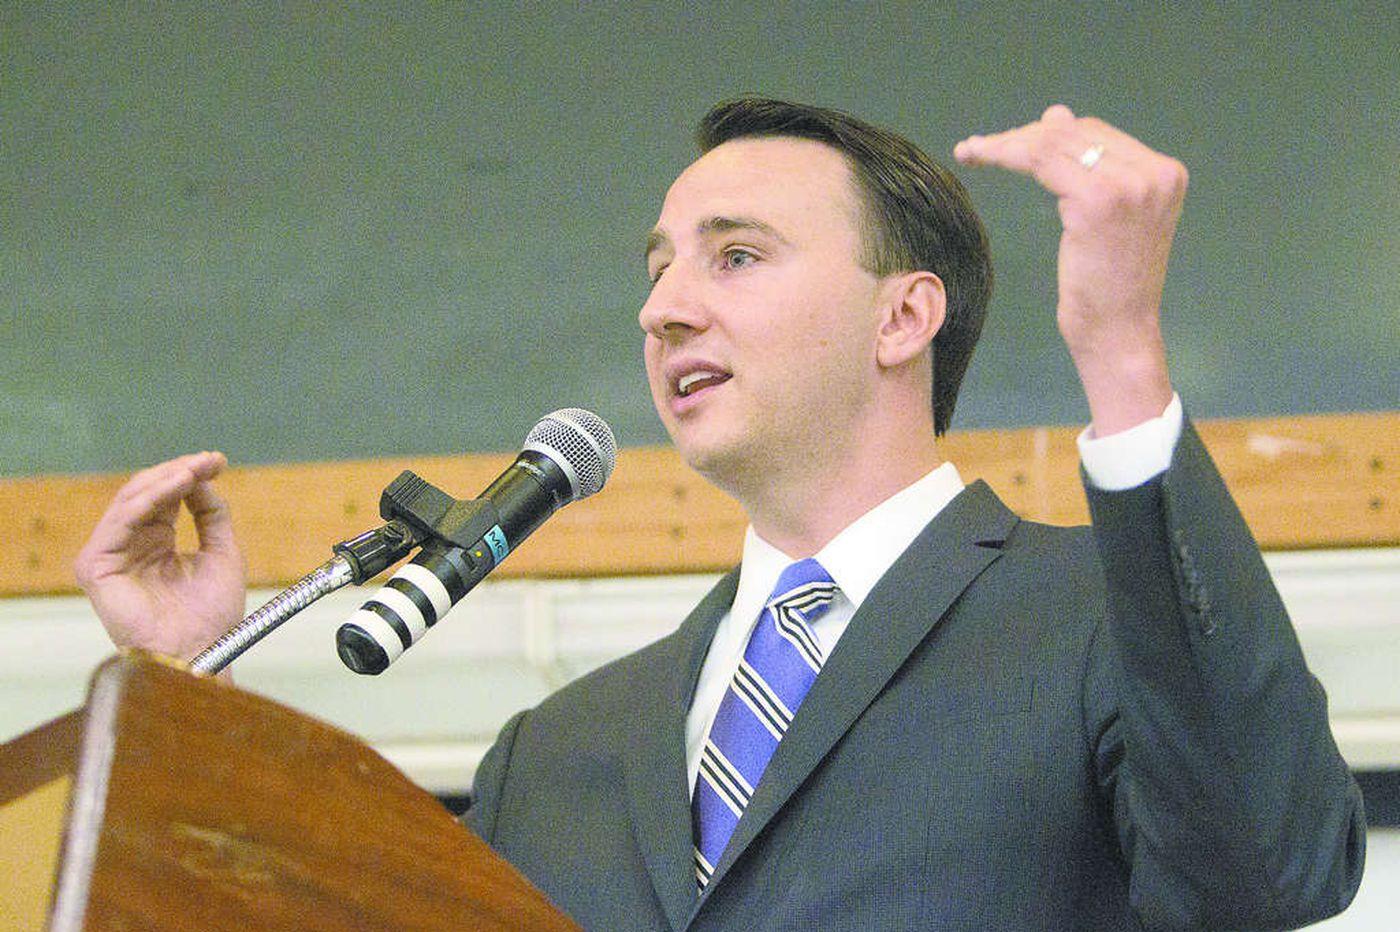 Former Pennsylvania Republican congressman Ryan Costello is taking steps to run for Senate in 2022